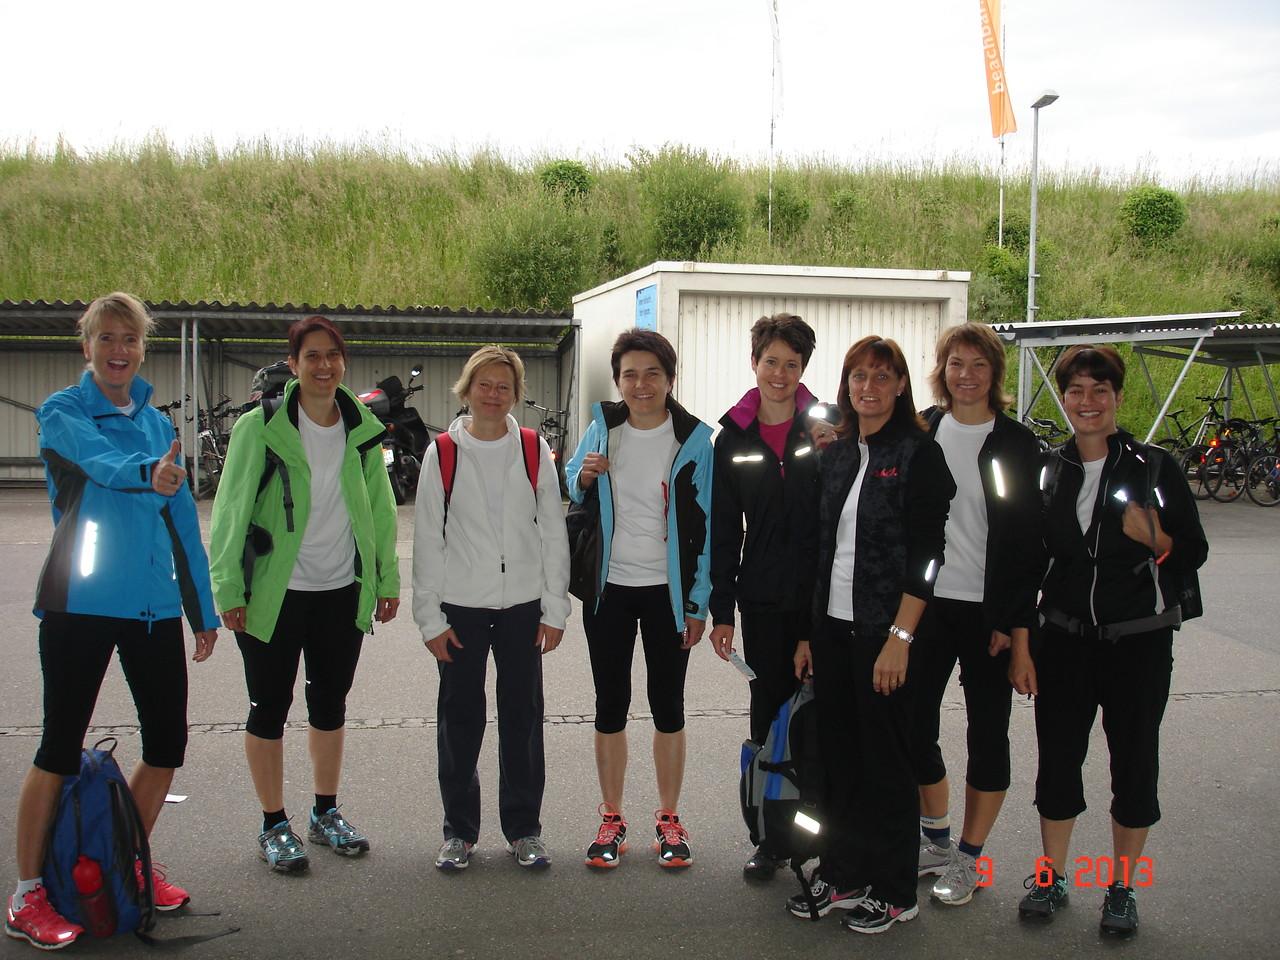 9 sportbegeisterte Frauen am Nottwiler Bahnhof.....